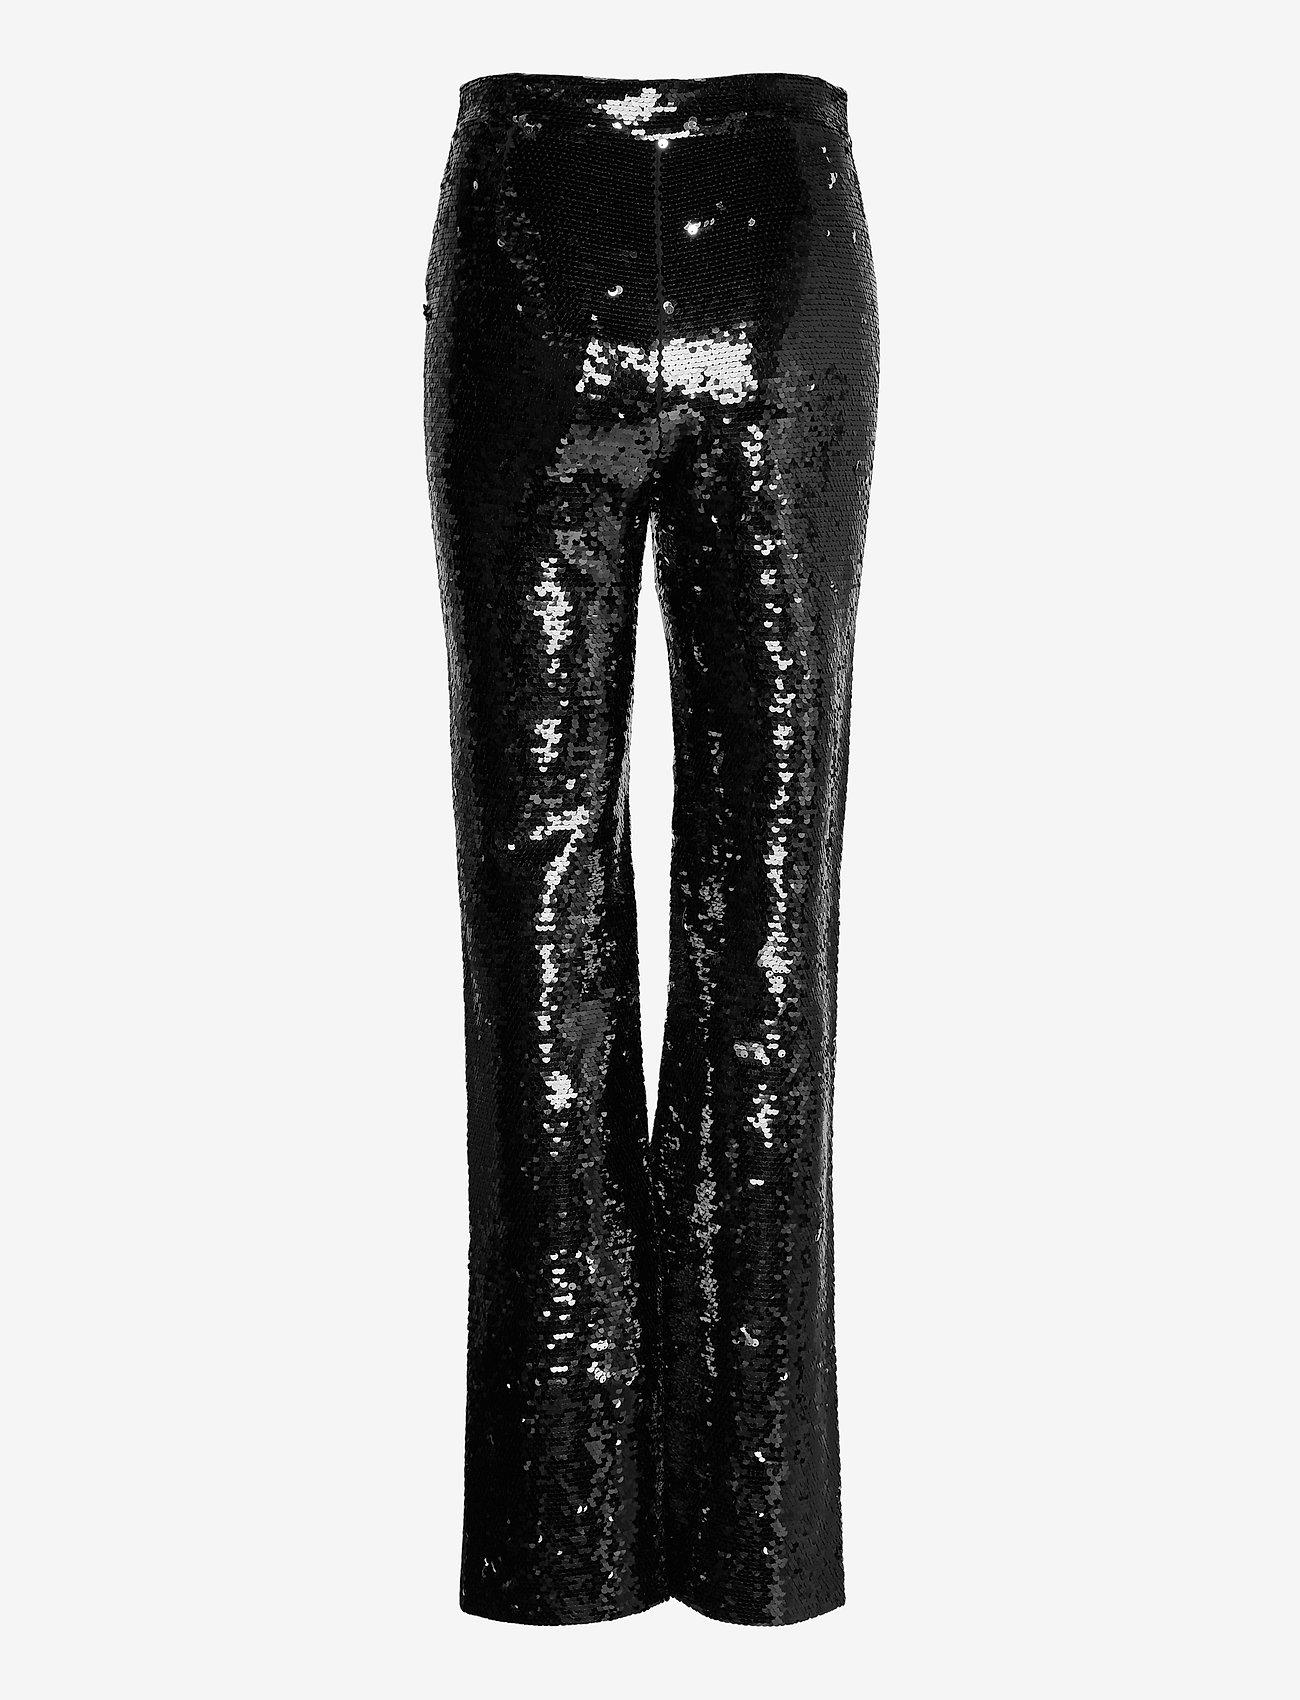 Custommade - Paola By NBS - raka byxor - anthracite black - 1